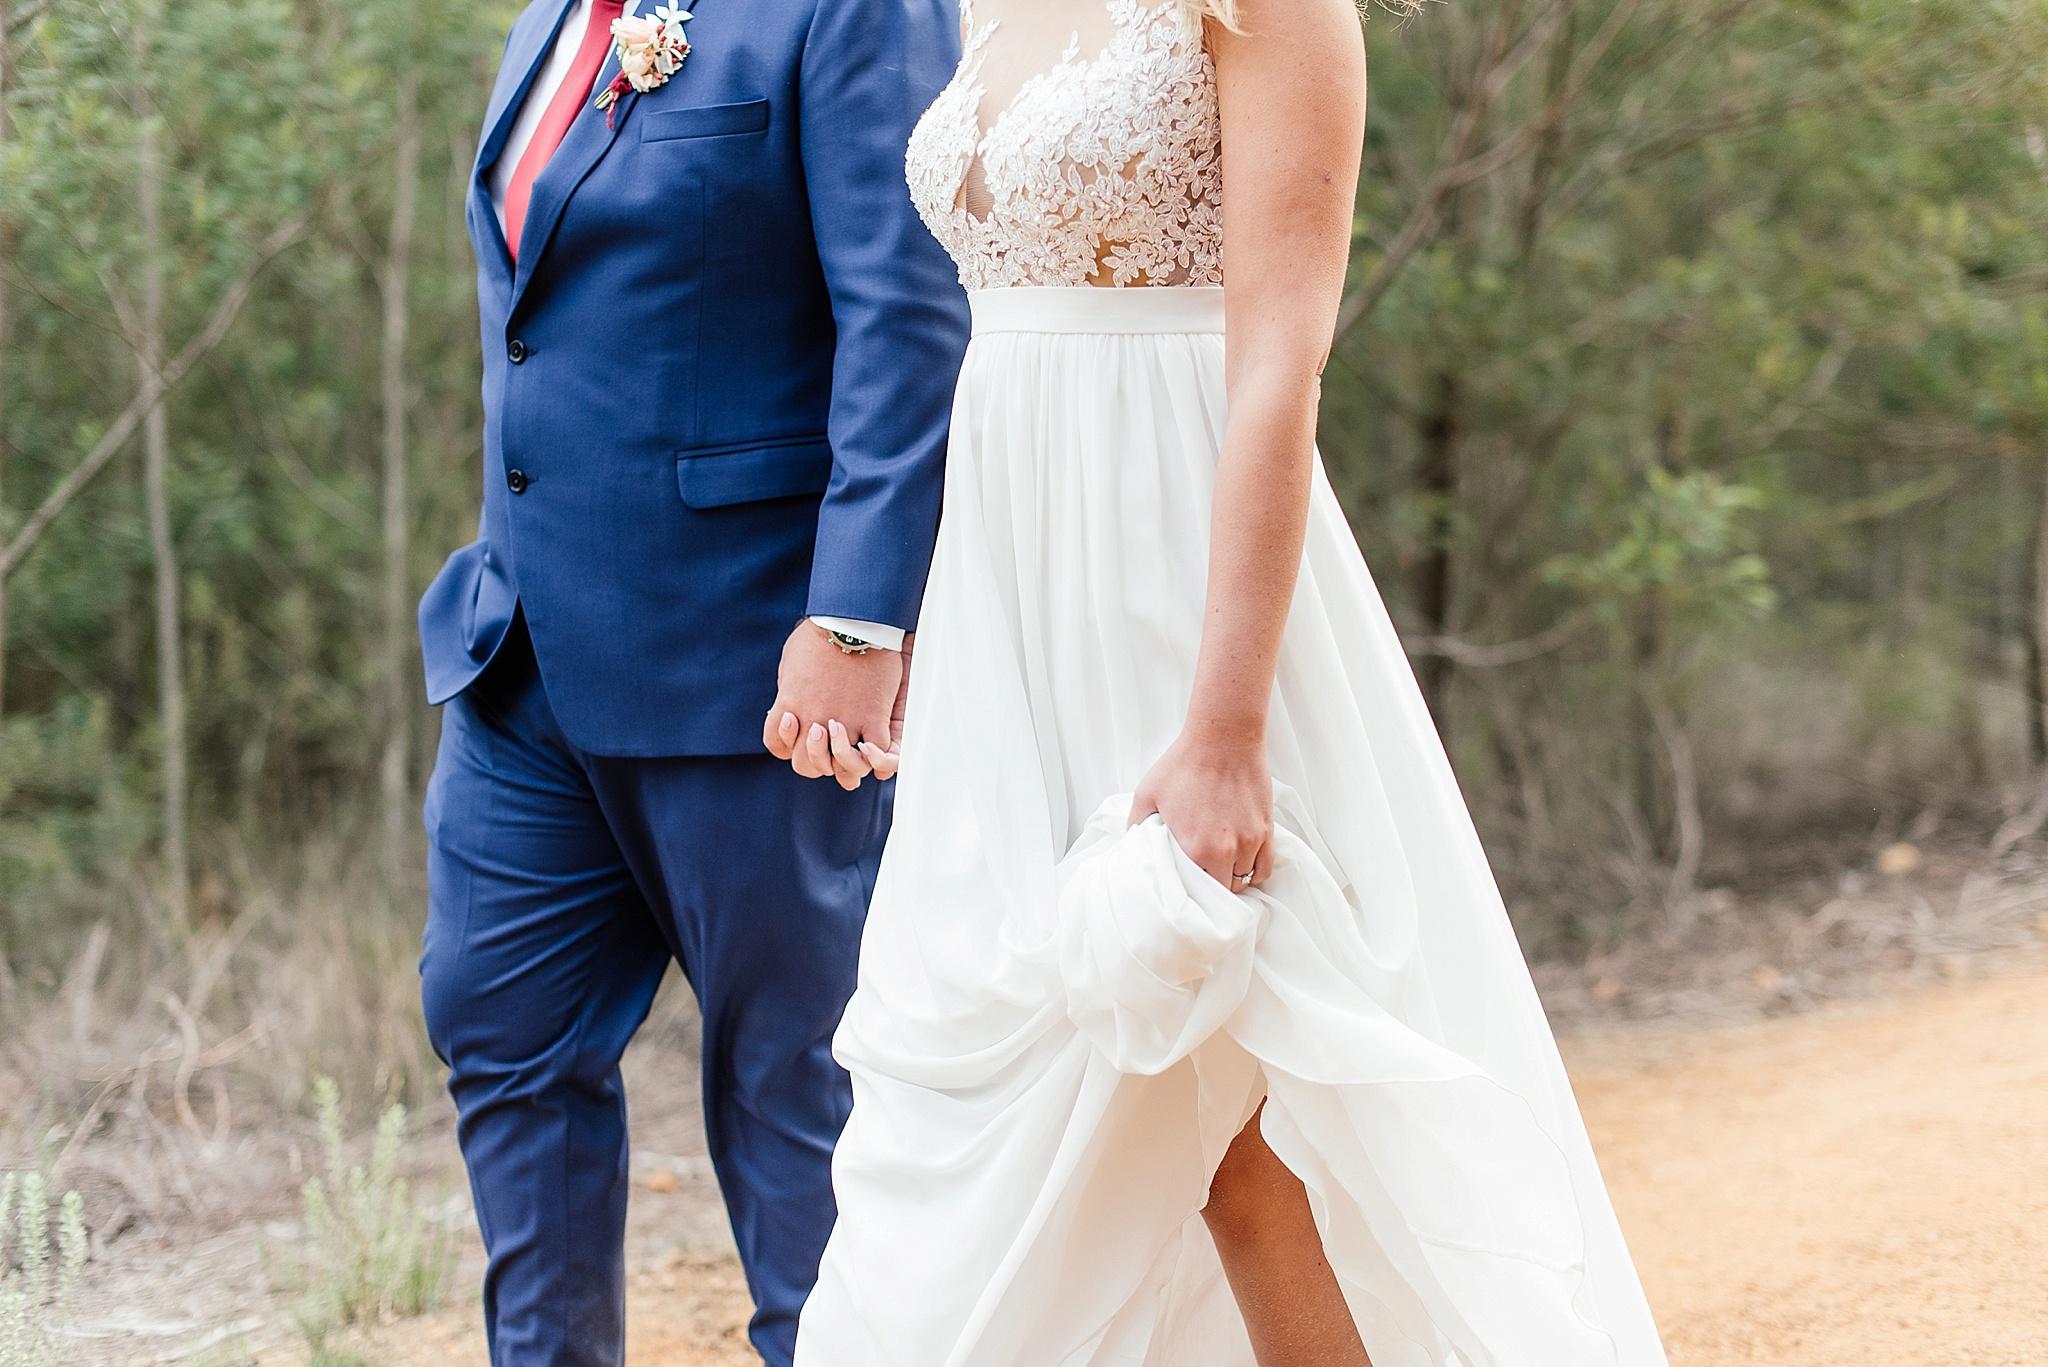 Cape Town Photographer Darren Bester - Die Woud Wedding - Gareth & Roxanne_0033.jpg